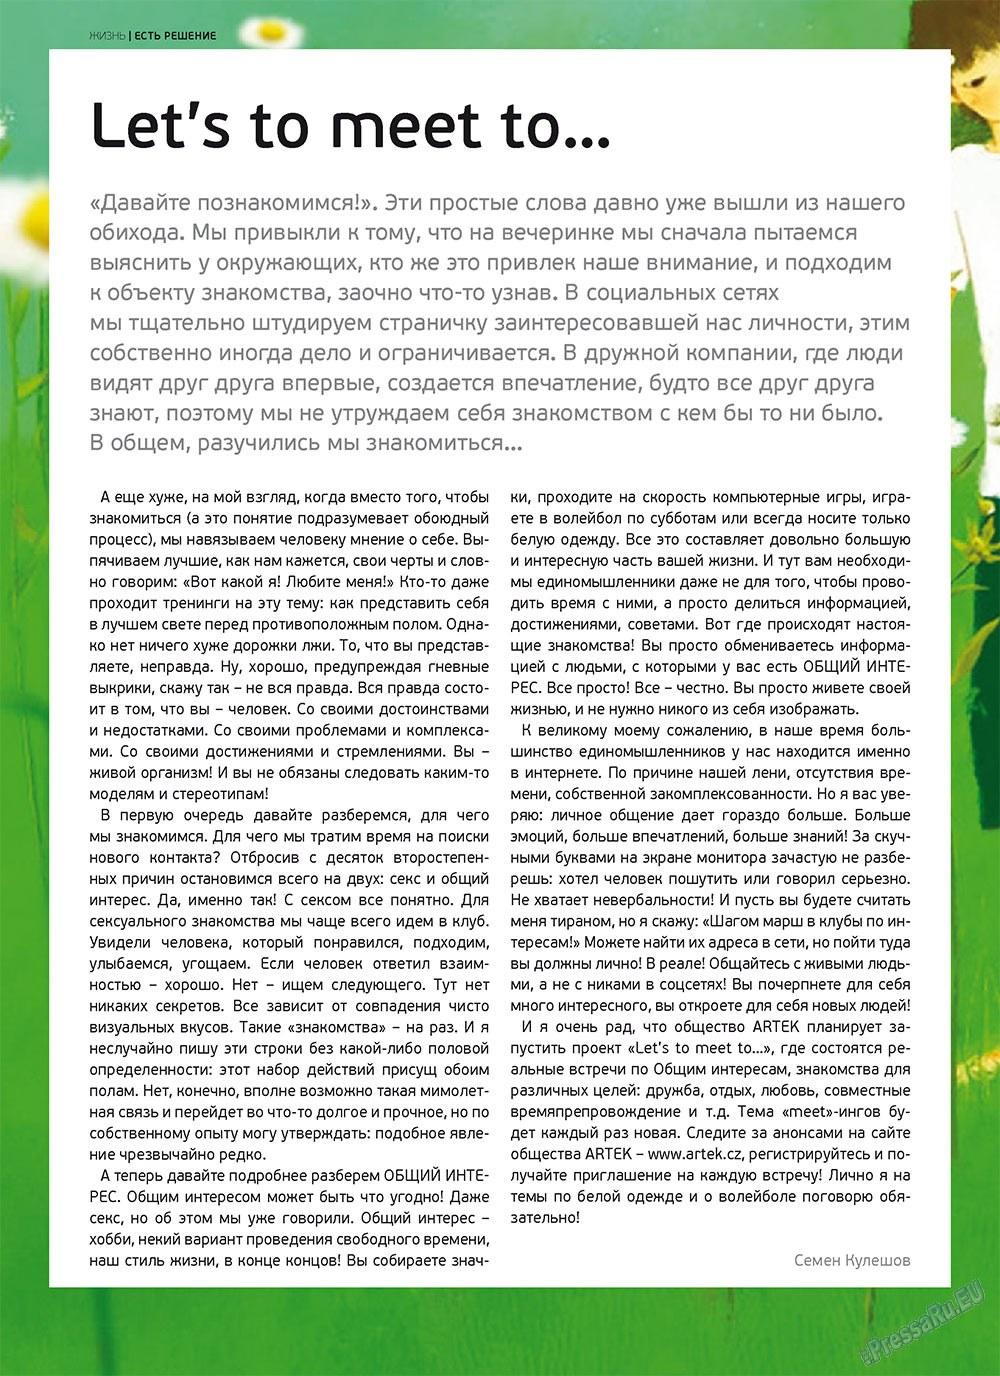 Артек (журнал). 2011 год, номер 3, стр. 22